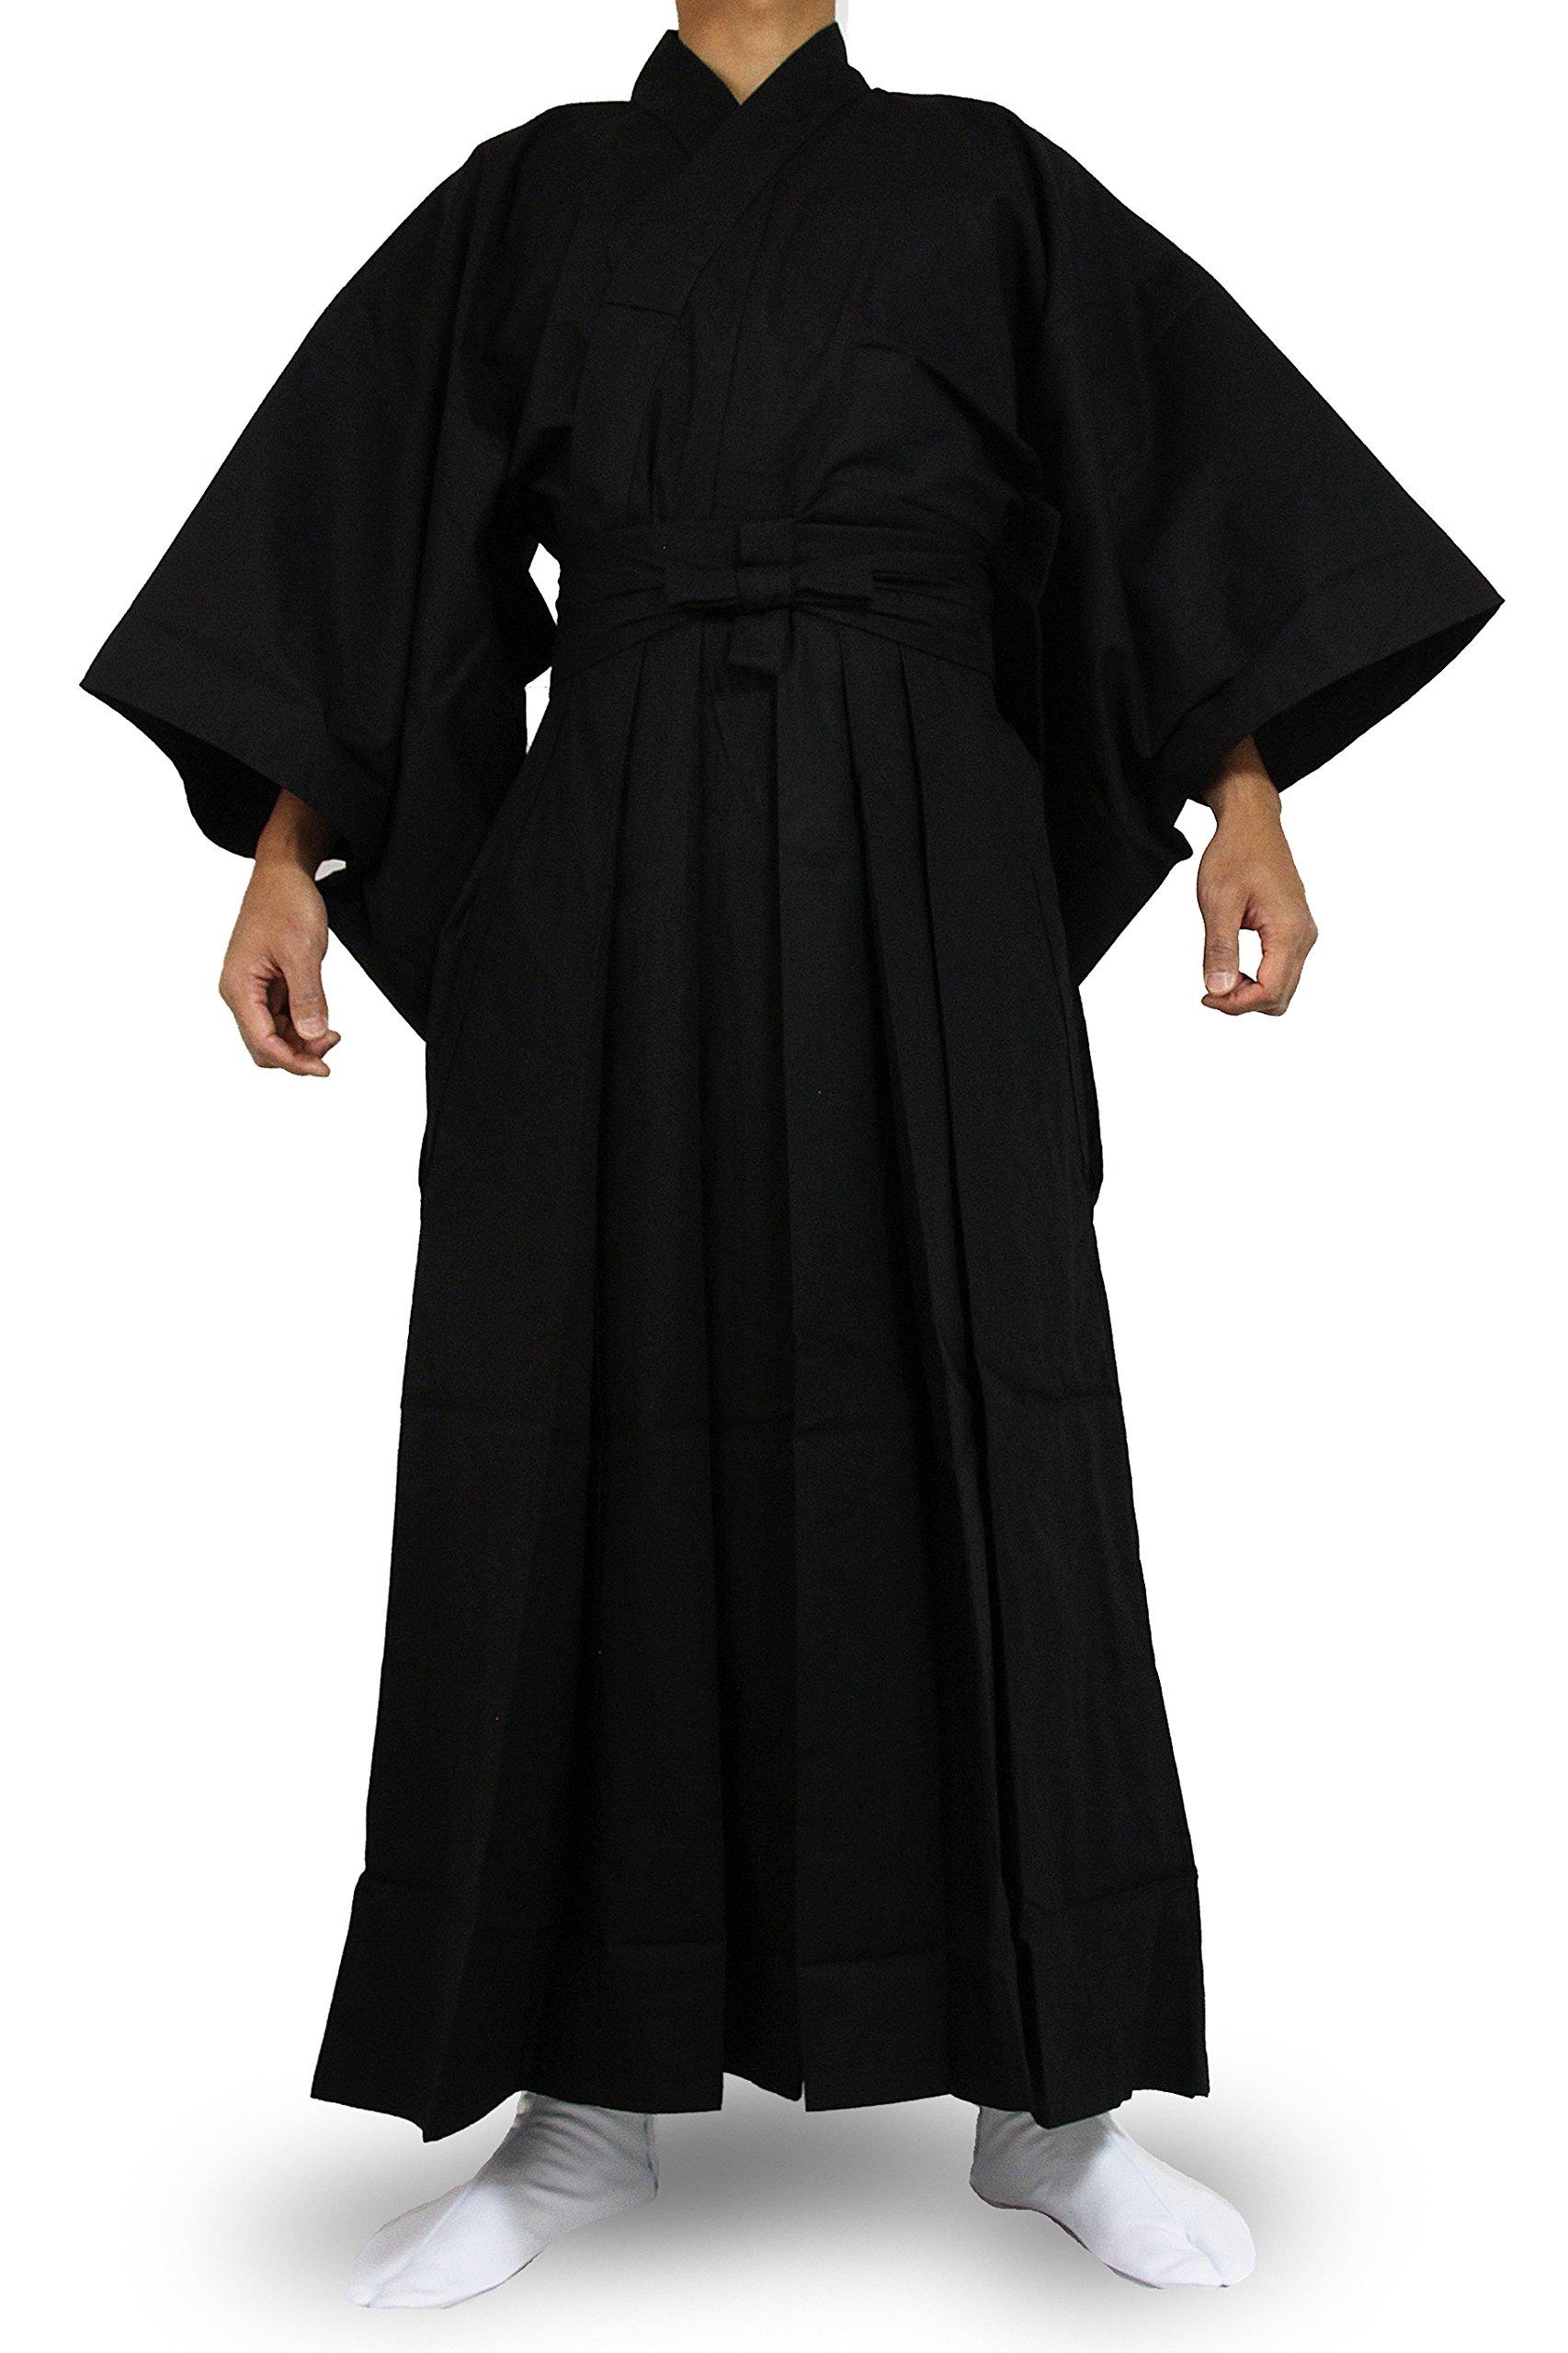 Edoten Japanese Samurai Hakama Uniform BK-BK M